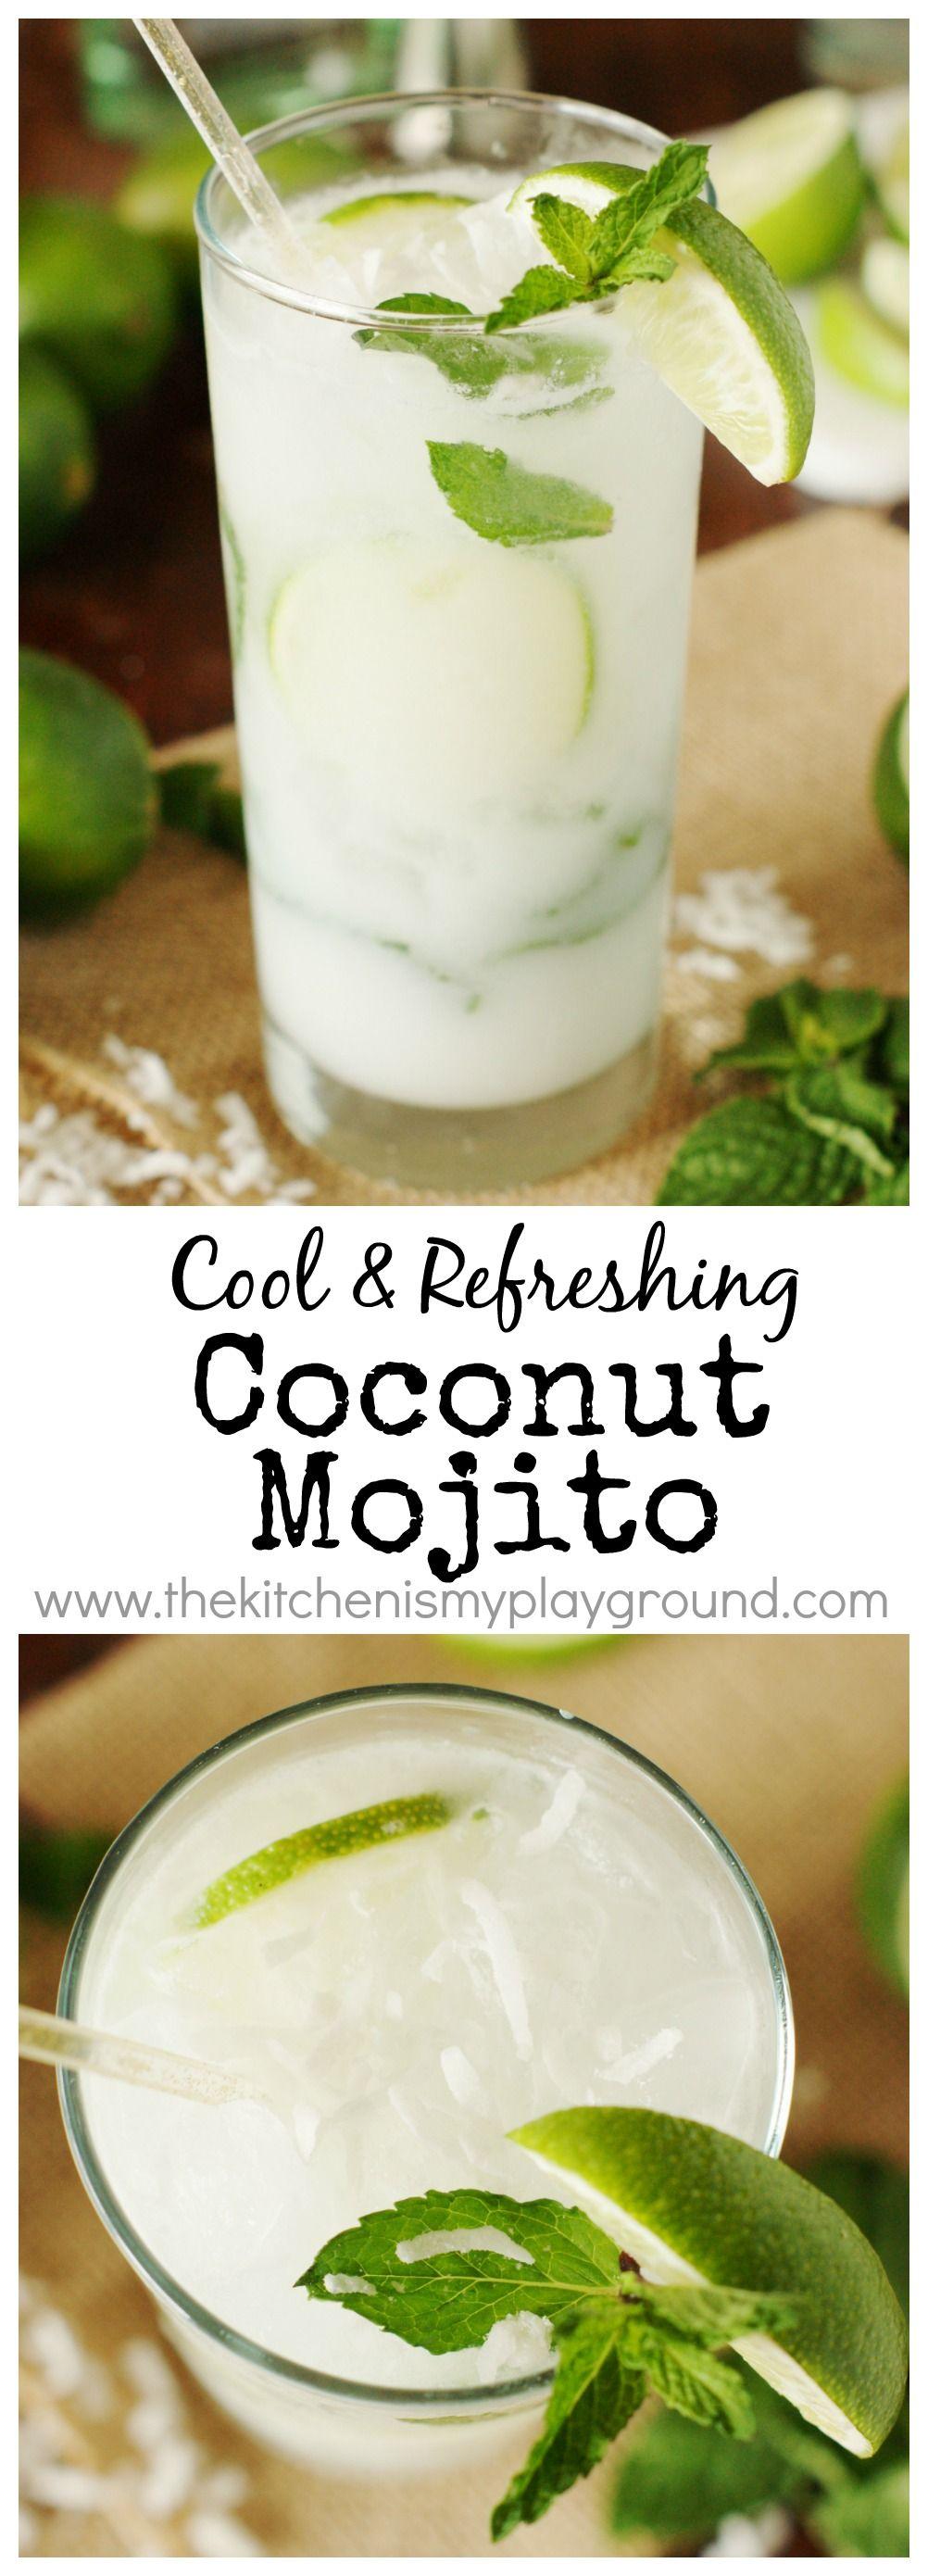 Not into Margaritas? Enjoy a refreshing Coconut Mojito for your Cinco de Mayo